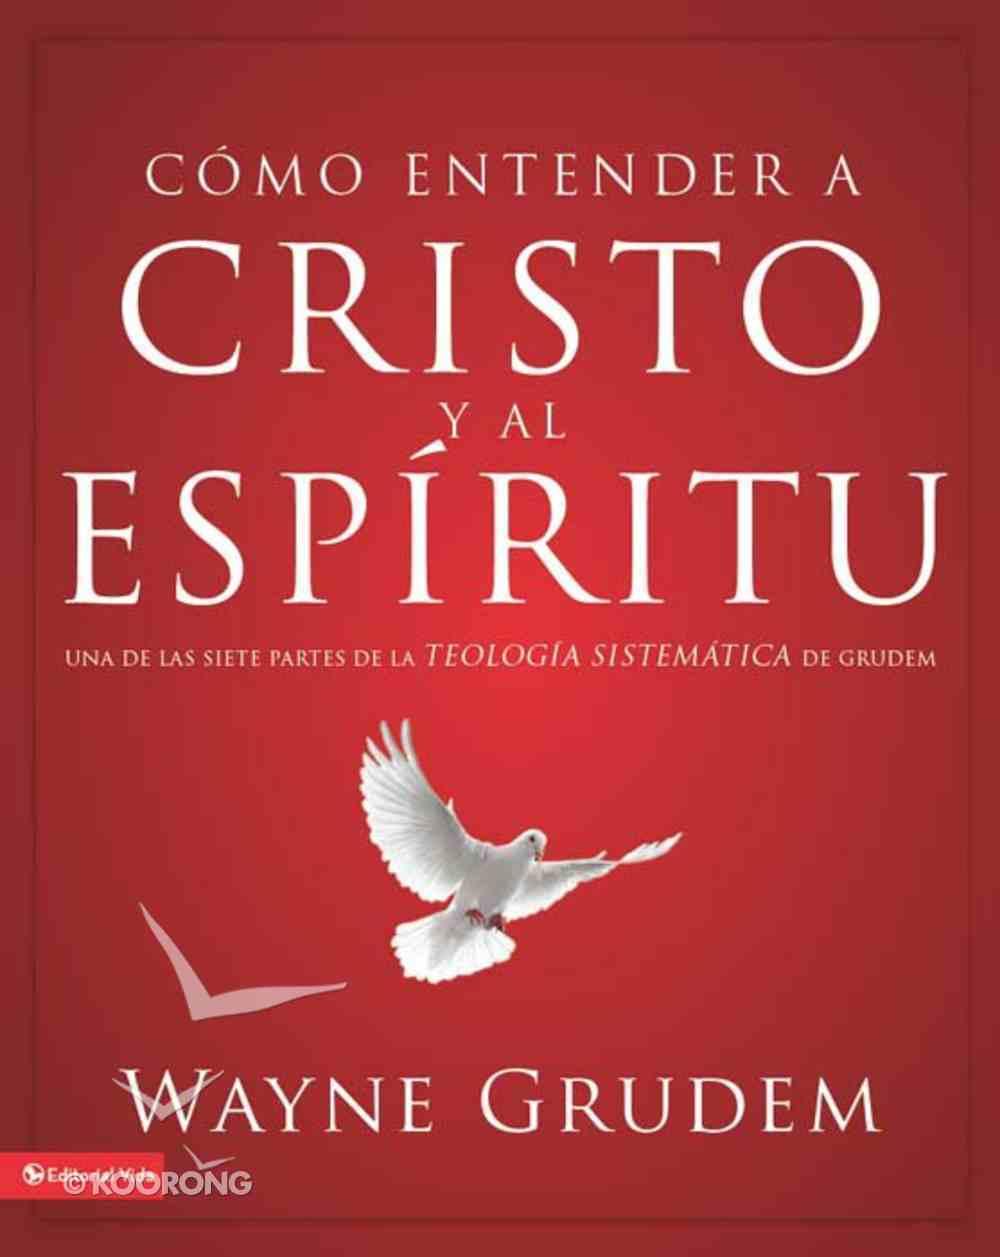 Cocmo Entender a Cristo Y El Espiritu (Spanish) (Spa) (Making Sense Of Christ And The Spirit) eBook